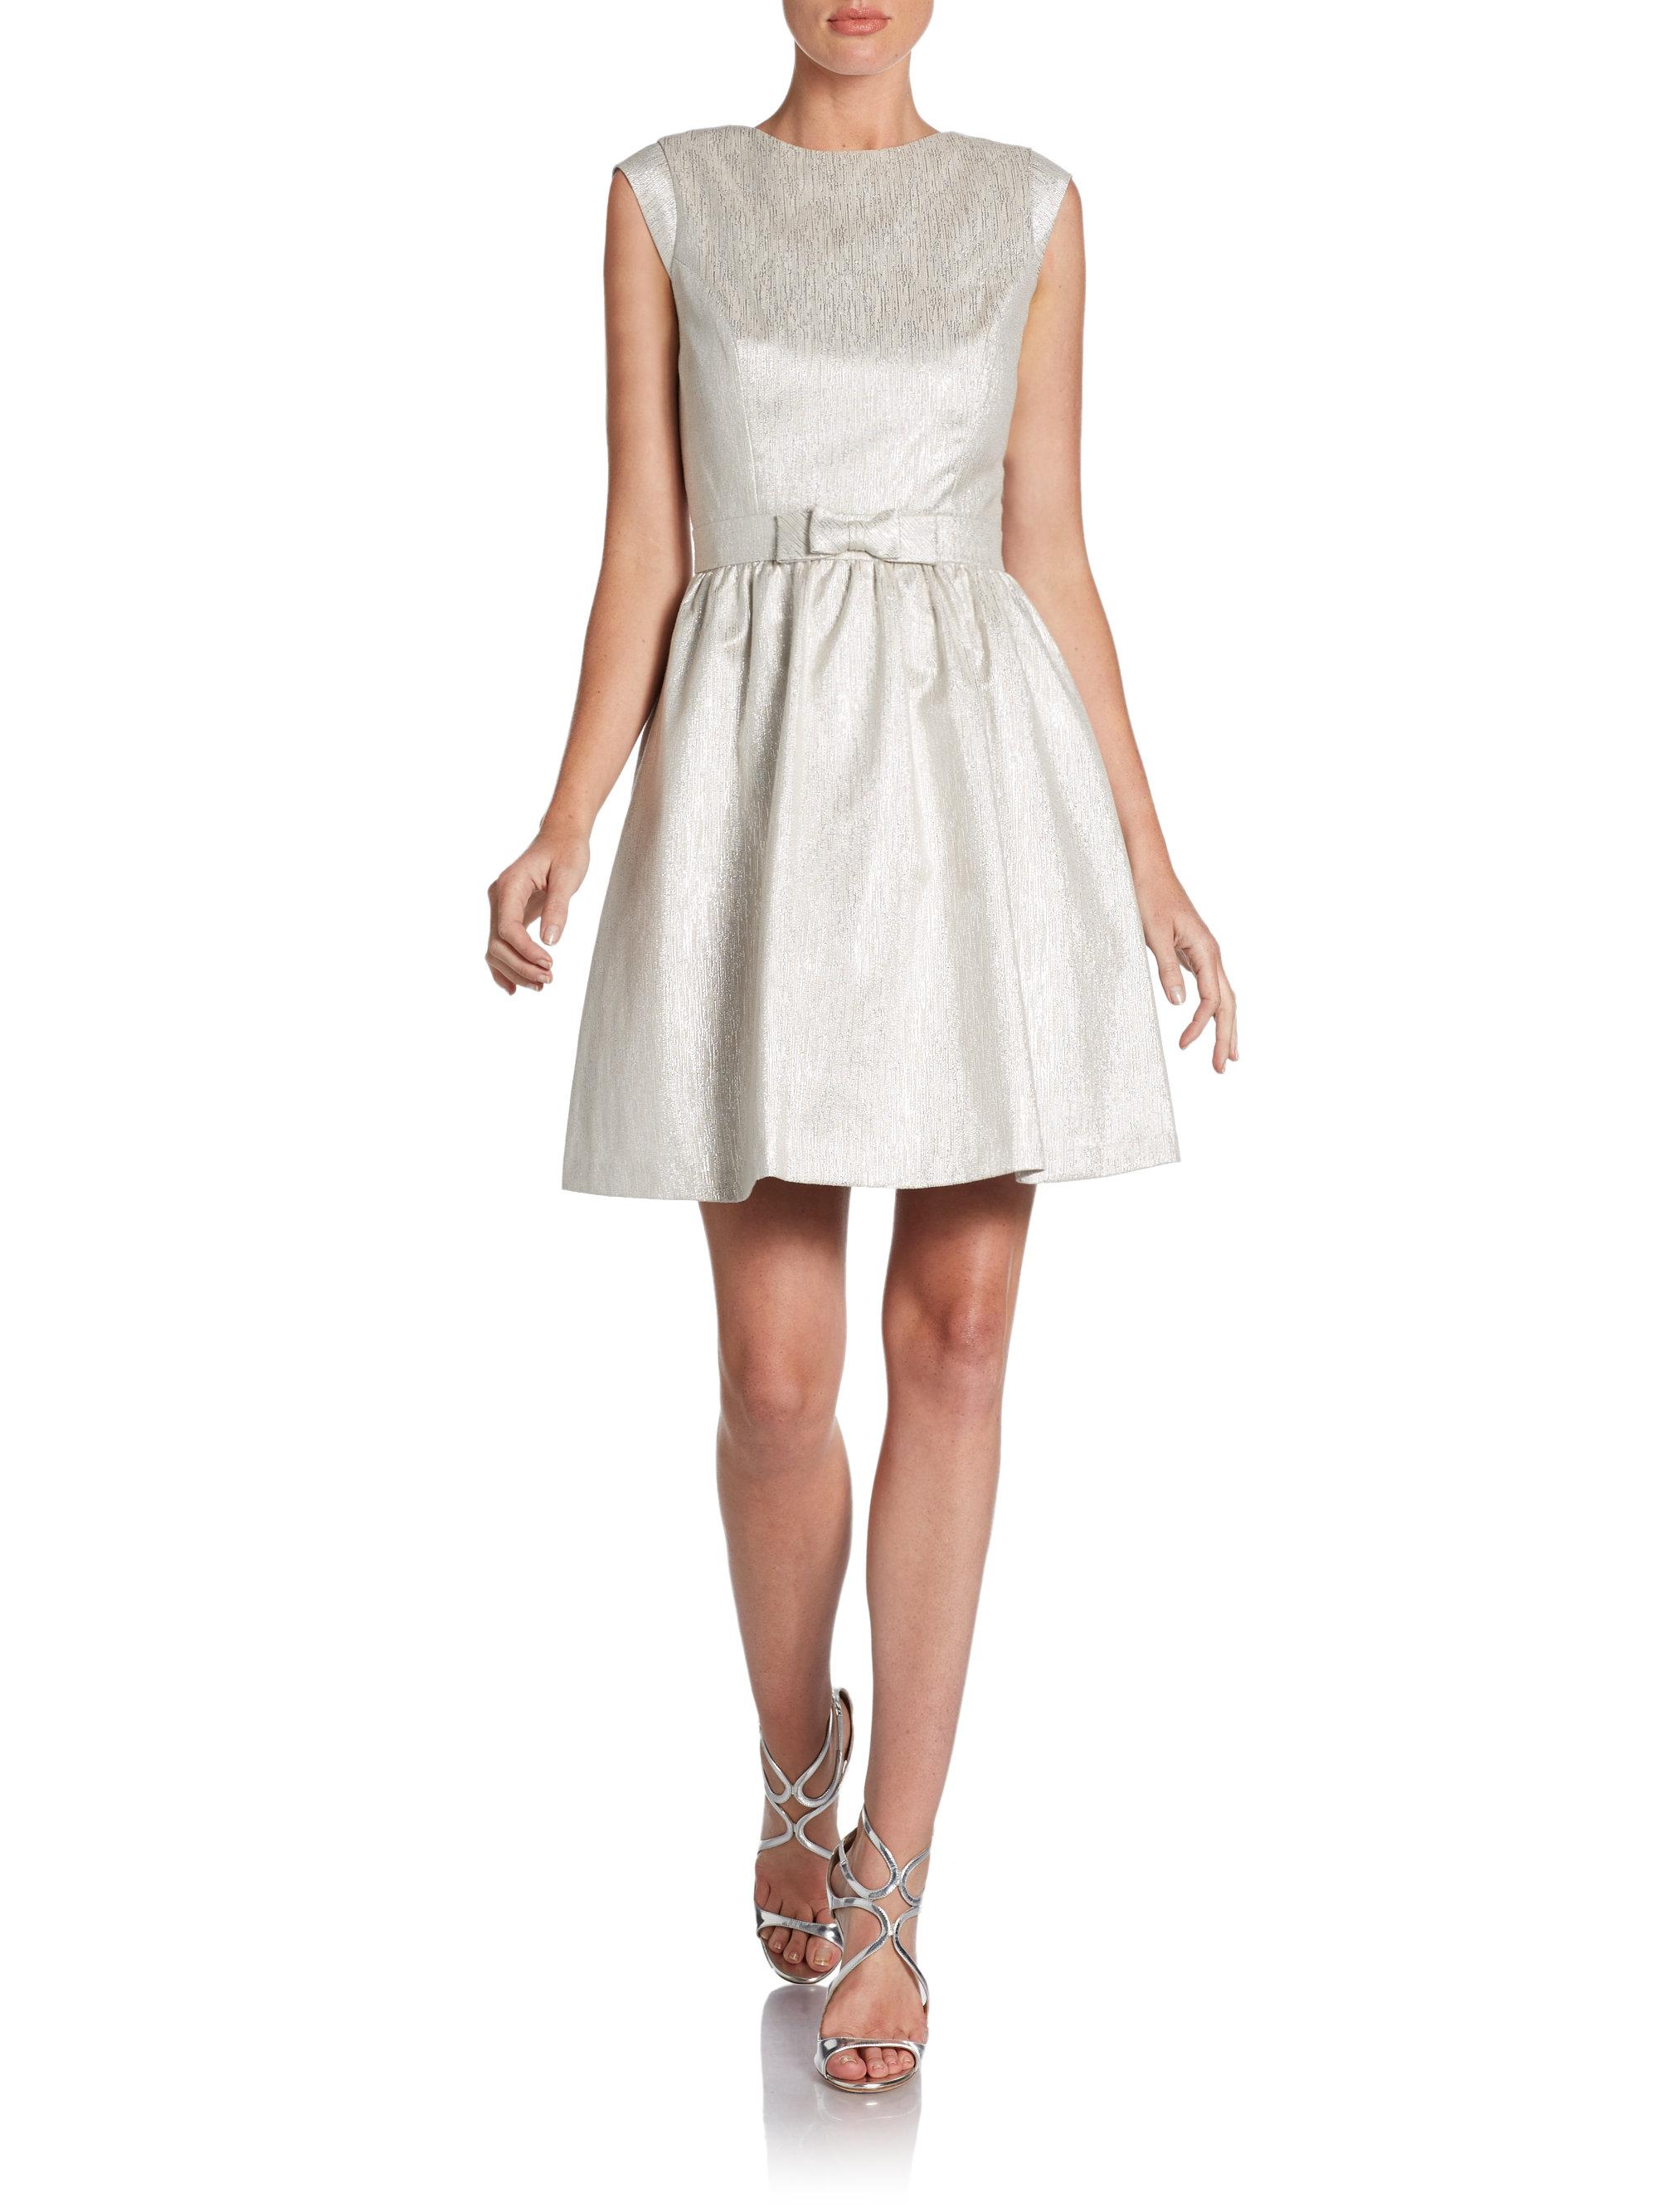 Cynthia Steffe Stella Bowdetail Fit Flare Cocktail Dress